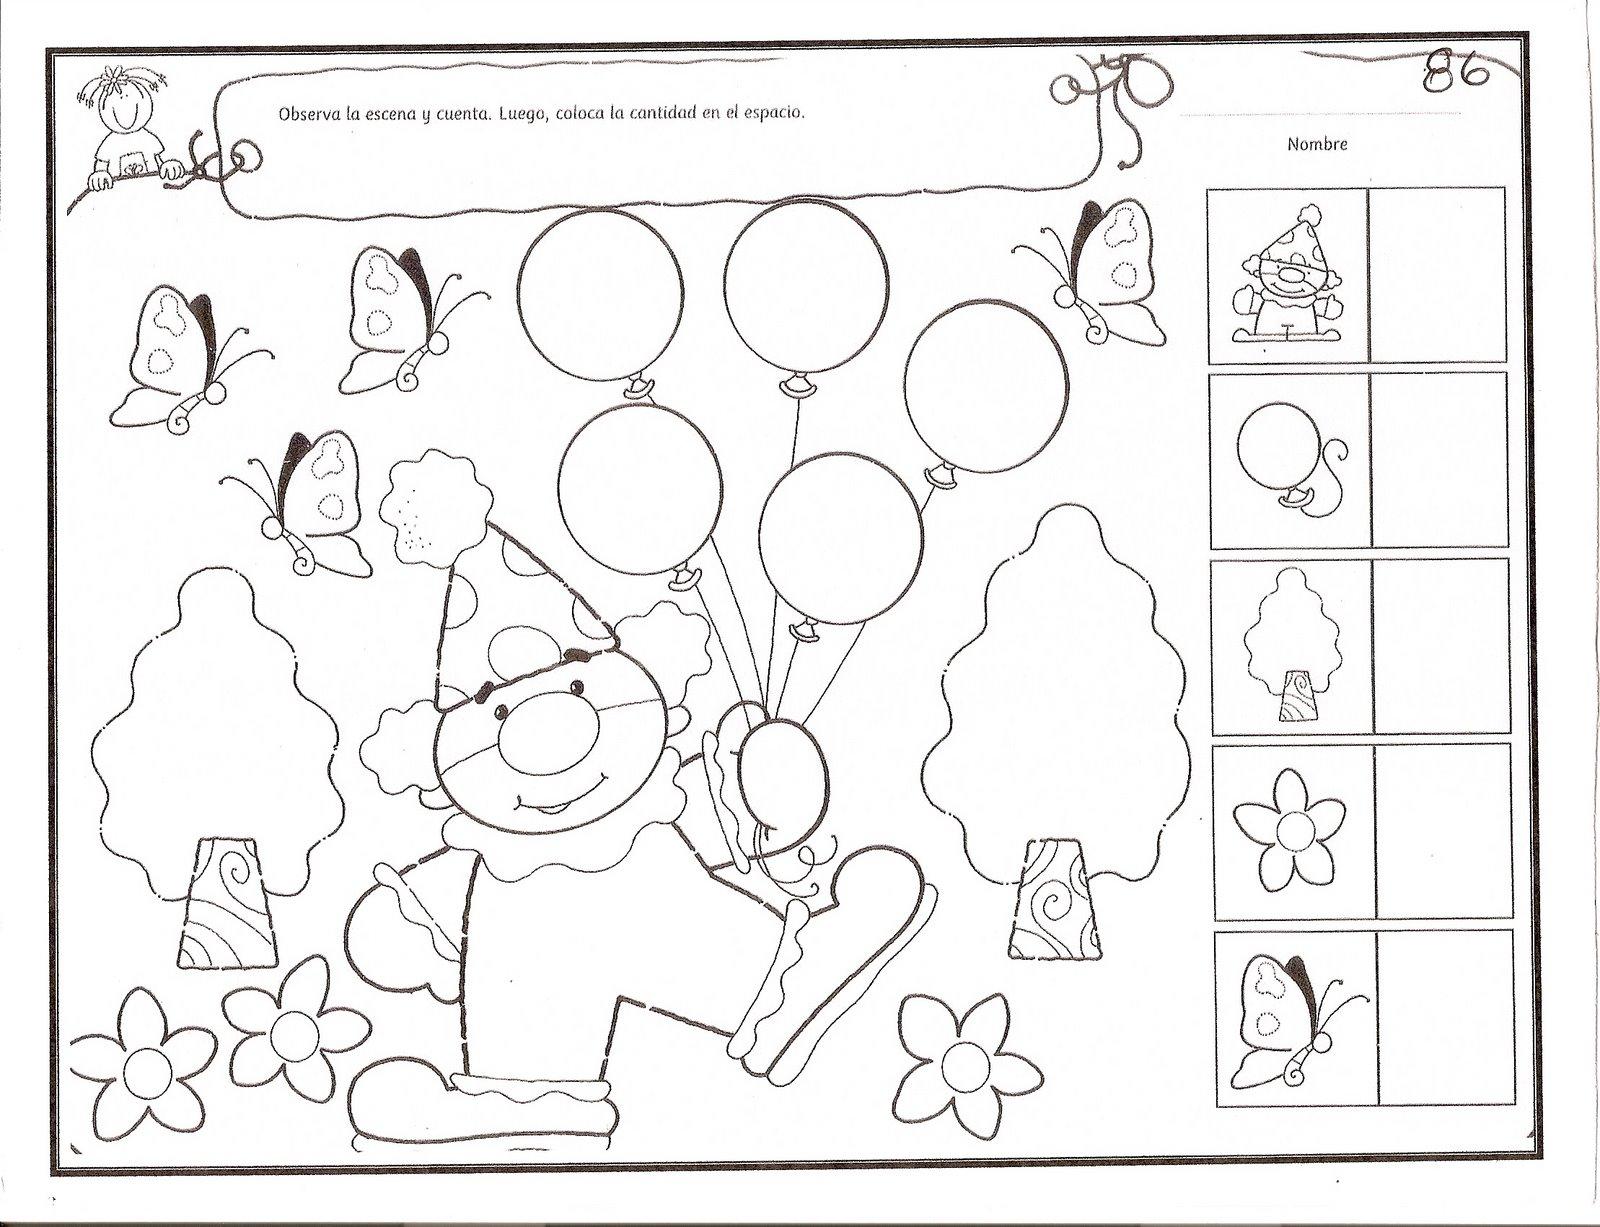 ▷ [PDF] Fichas de Pensamiento Matemático para Preescolar